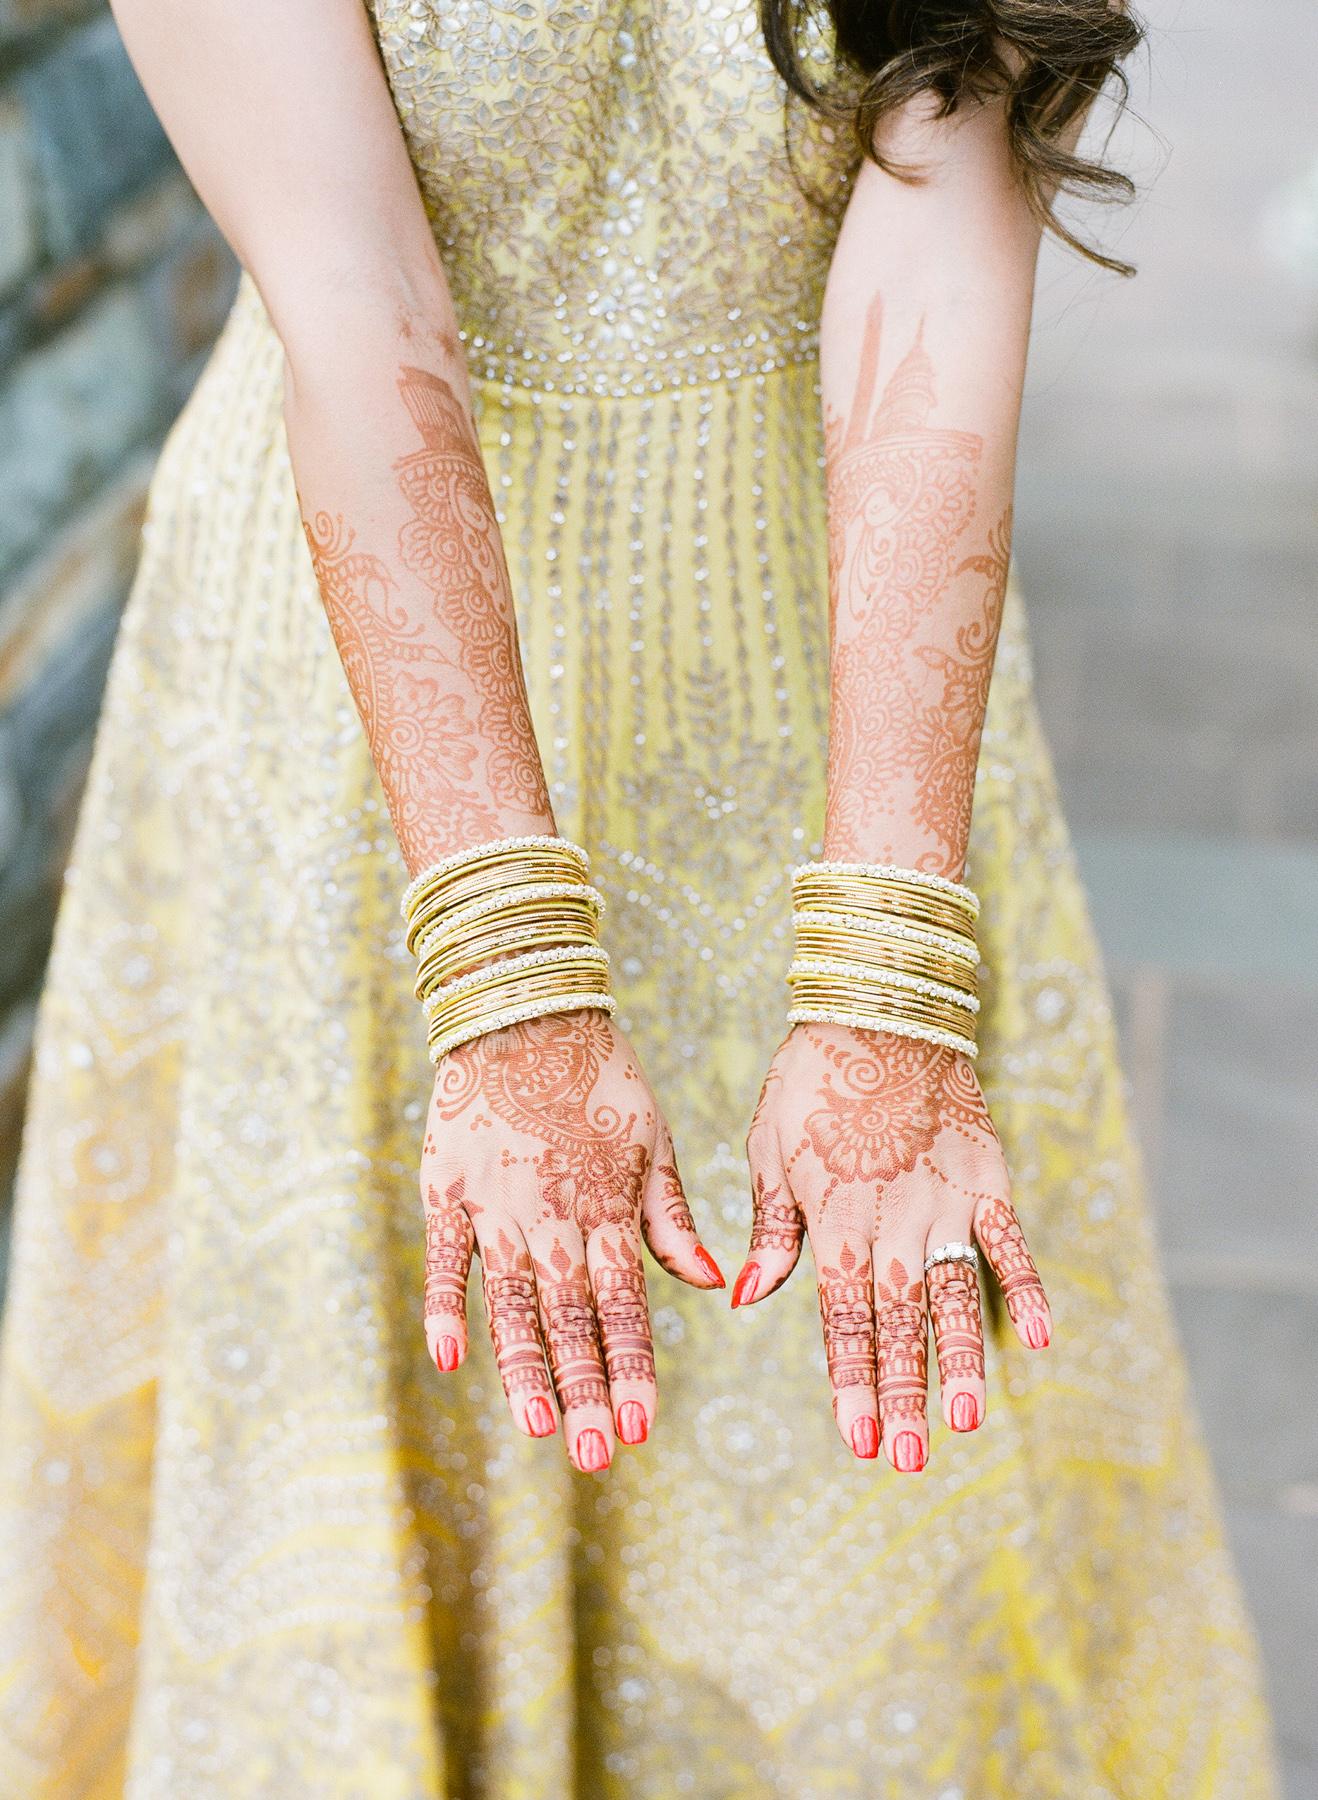 Indian-Wedding-Film-Photographer-05.jpg